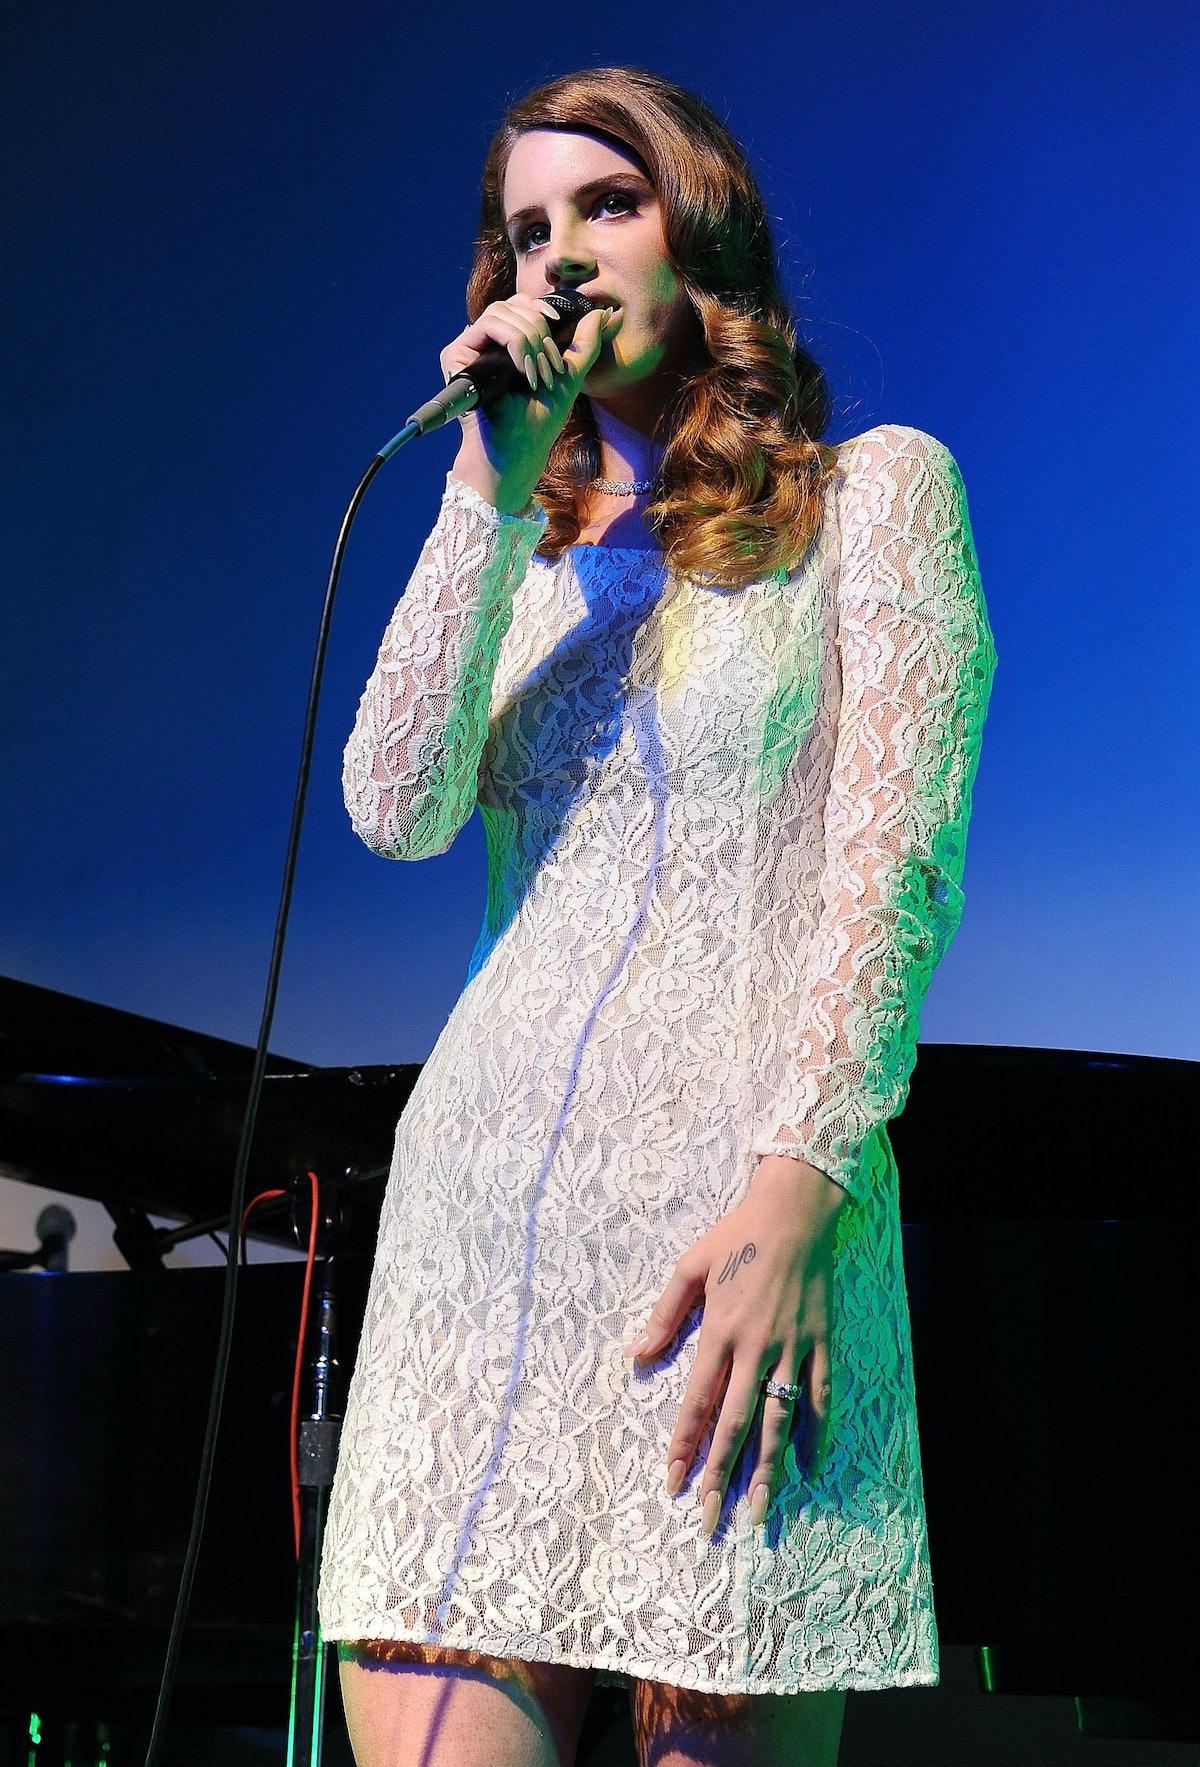 Lana Del Rey singing